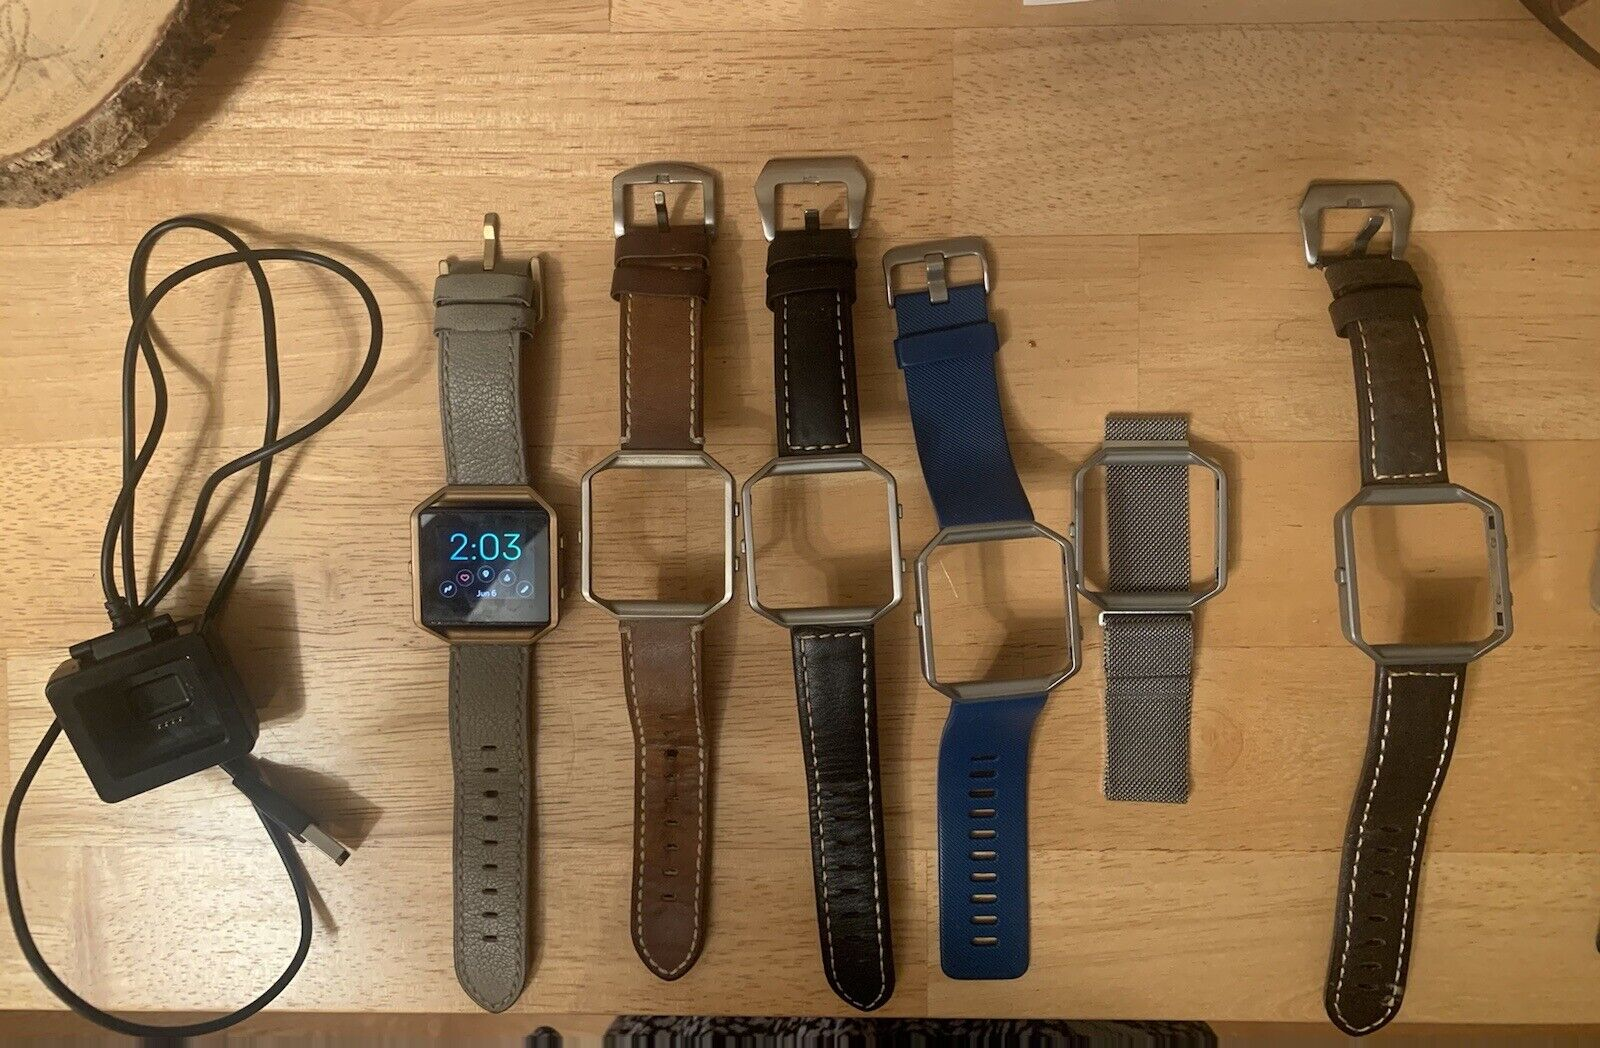 Fitbit Blaze FB502 Smart Fitness Watch Smartwatch Activity Tracker